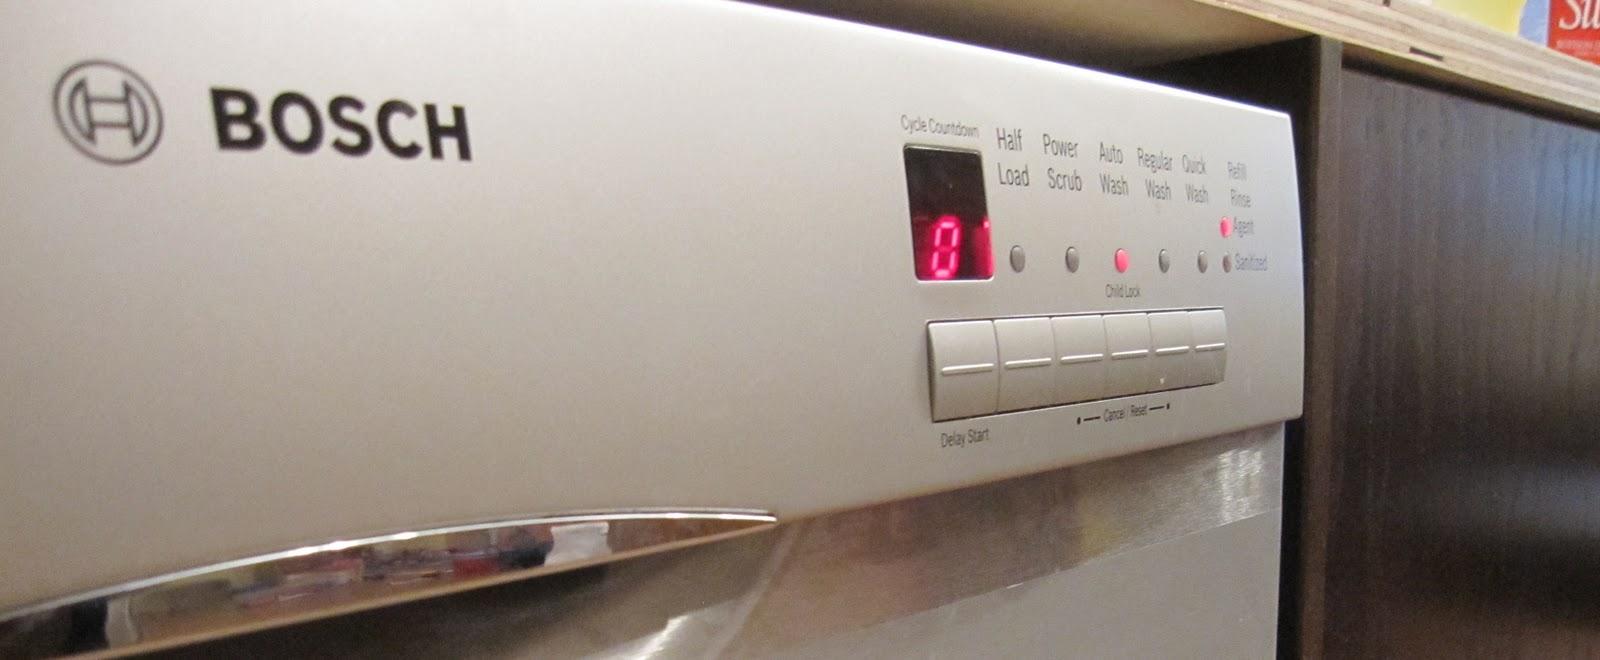 installation instructions bosch dishwasher smu50e05au